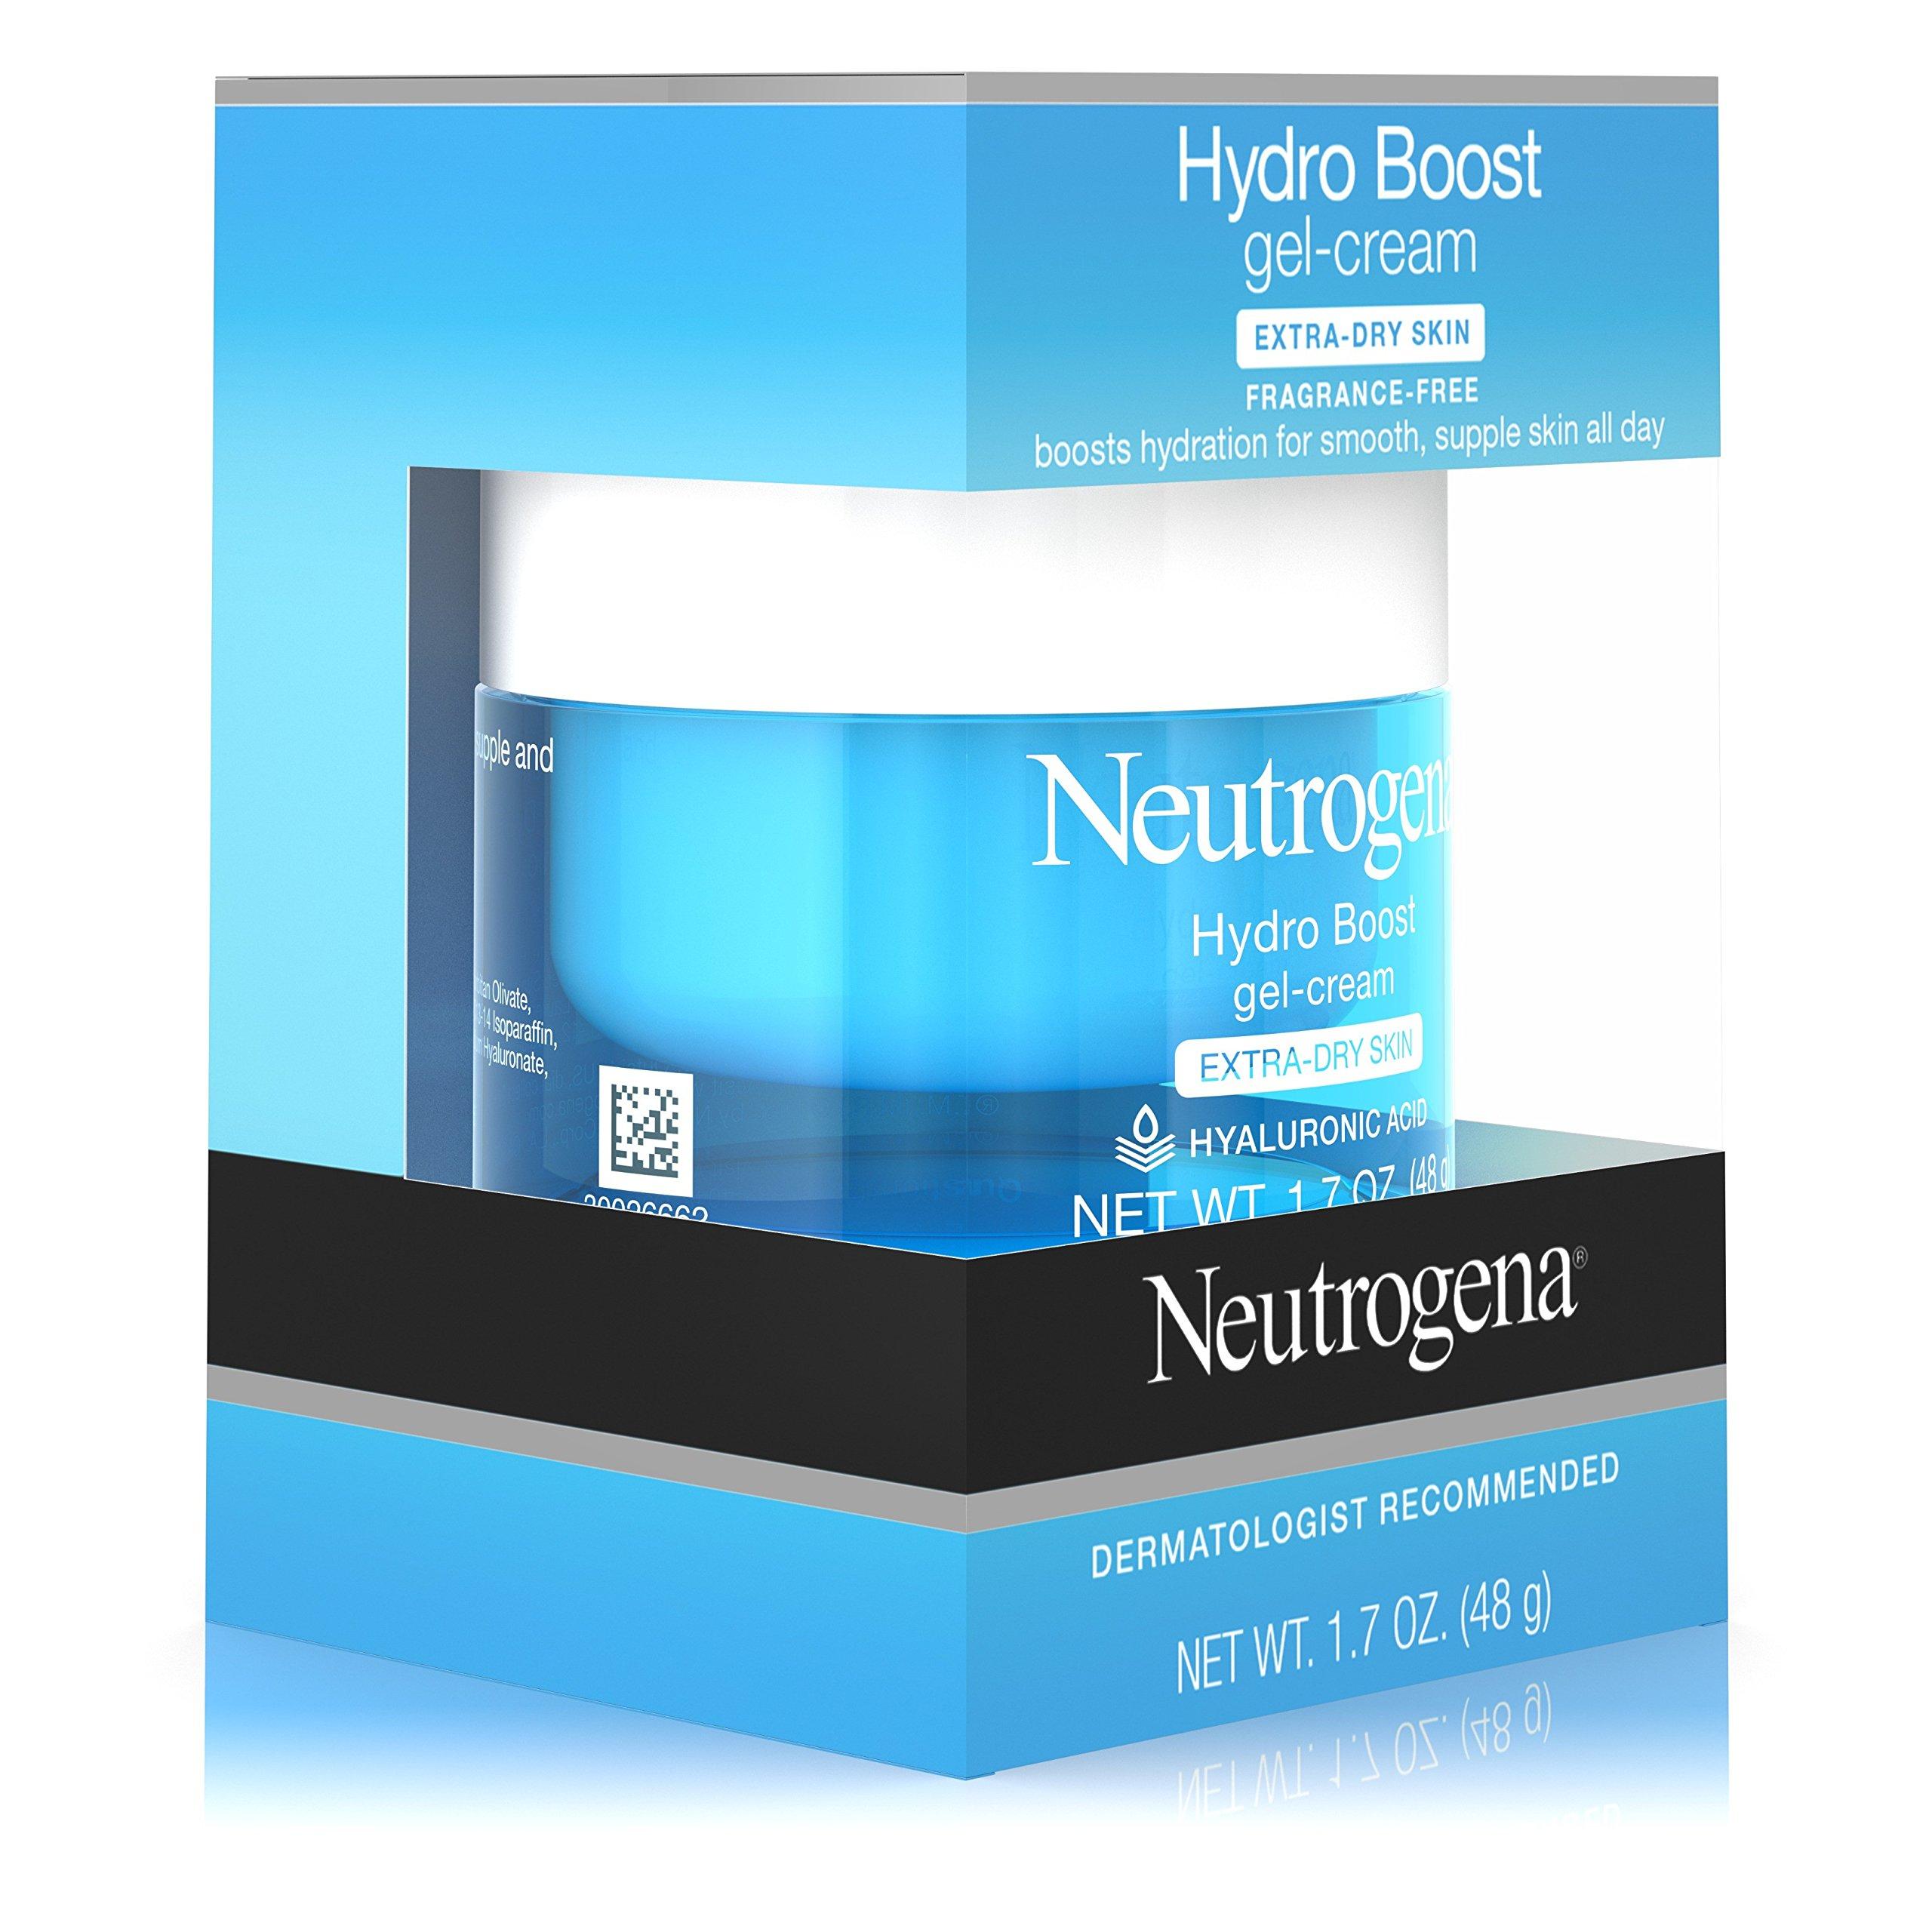 Neutrogena Hydro Boost Hyaluronic Acid Hydrating Face Moisturizer Gel-Cream to Hydrate and Smooth Extra-Dry Skin, 1.7 oz by Neutrogena (Image #6)